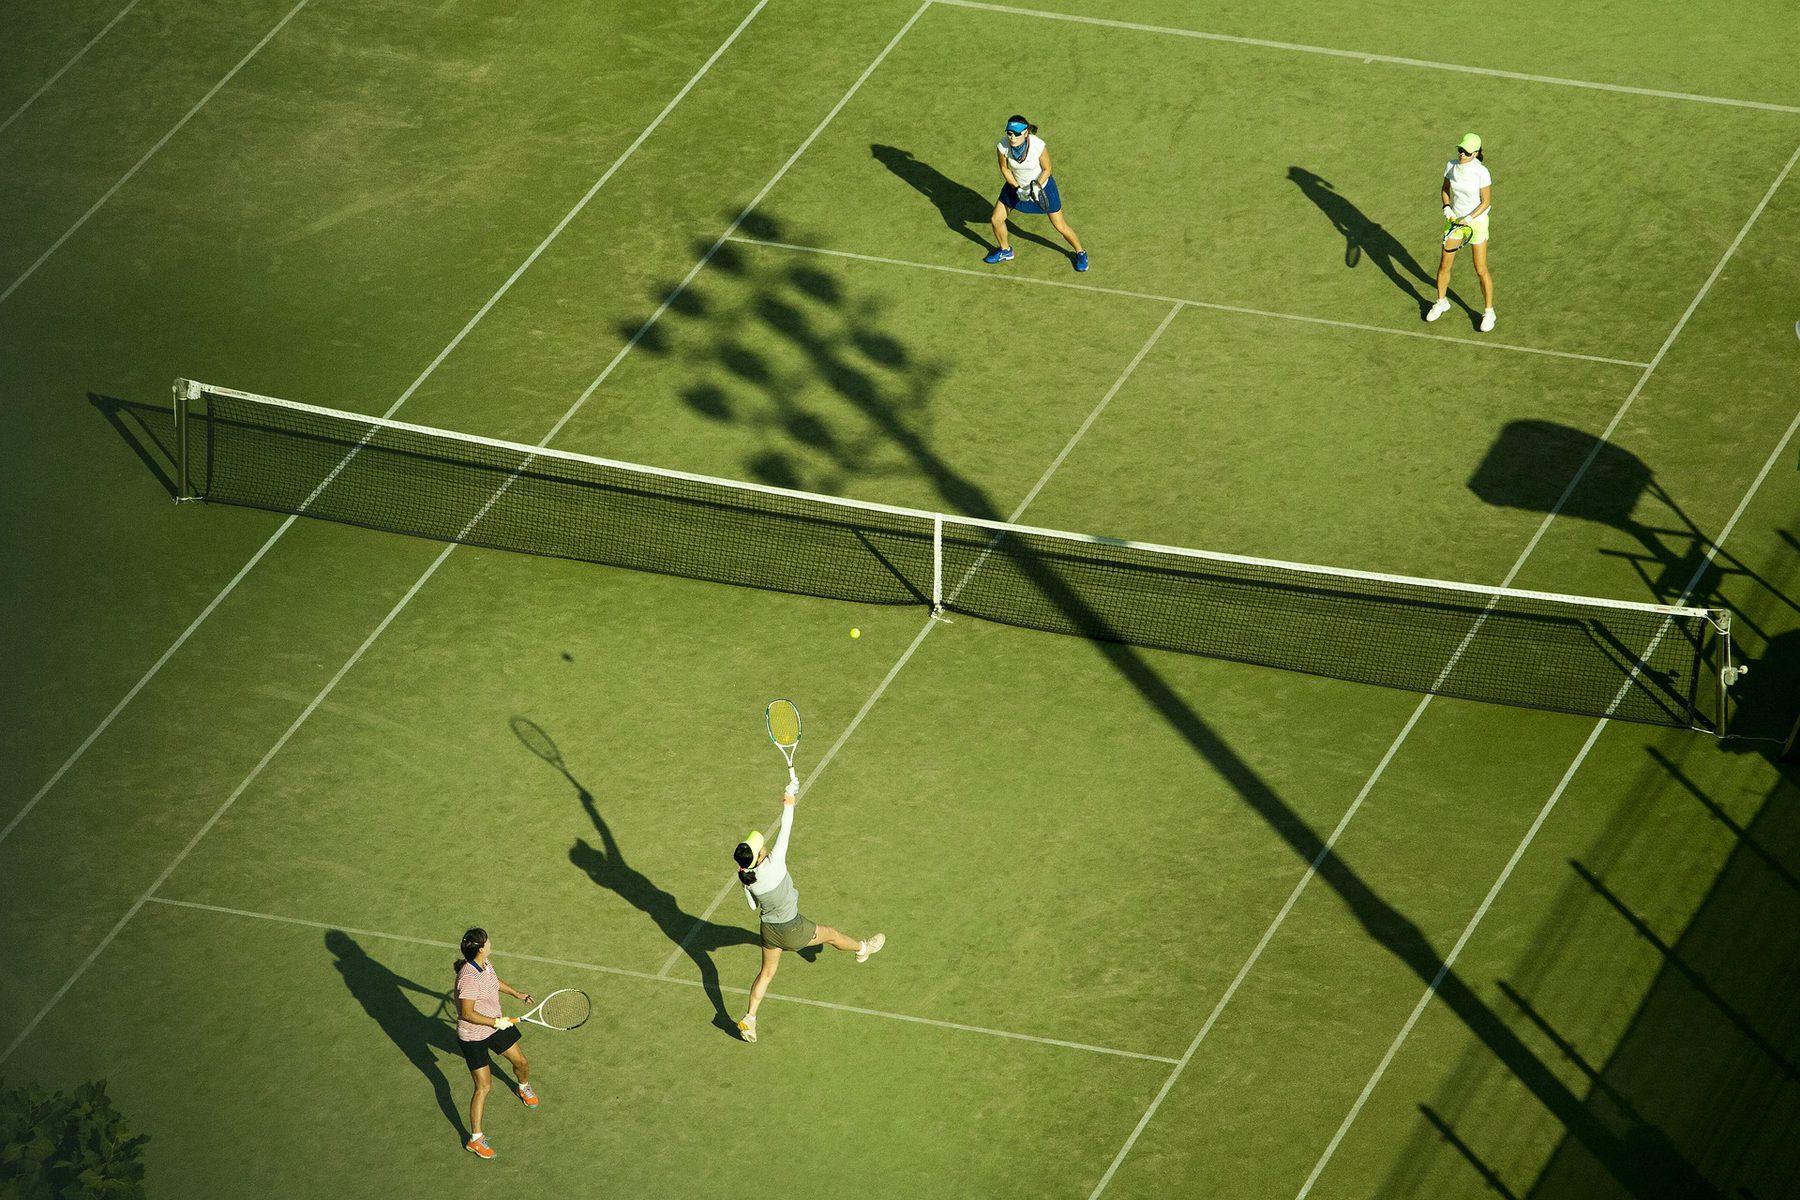 Job Role Image (Sports Journalist: Tennis Match)